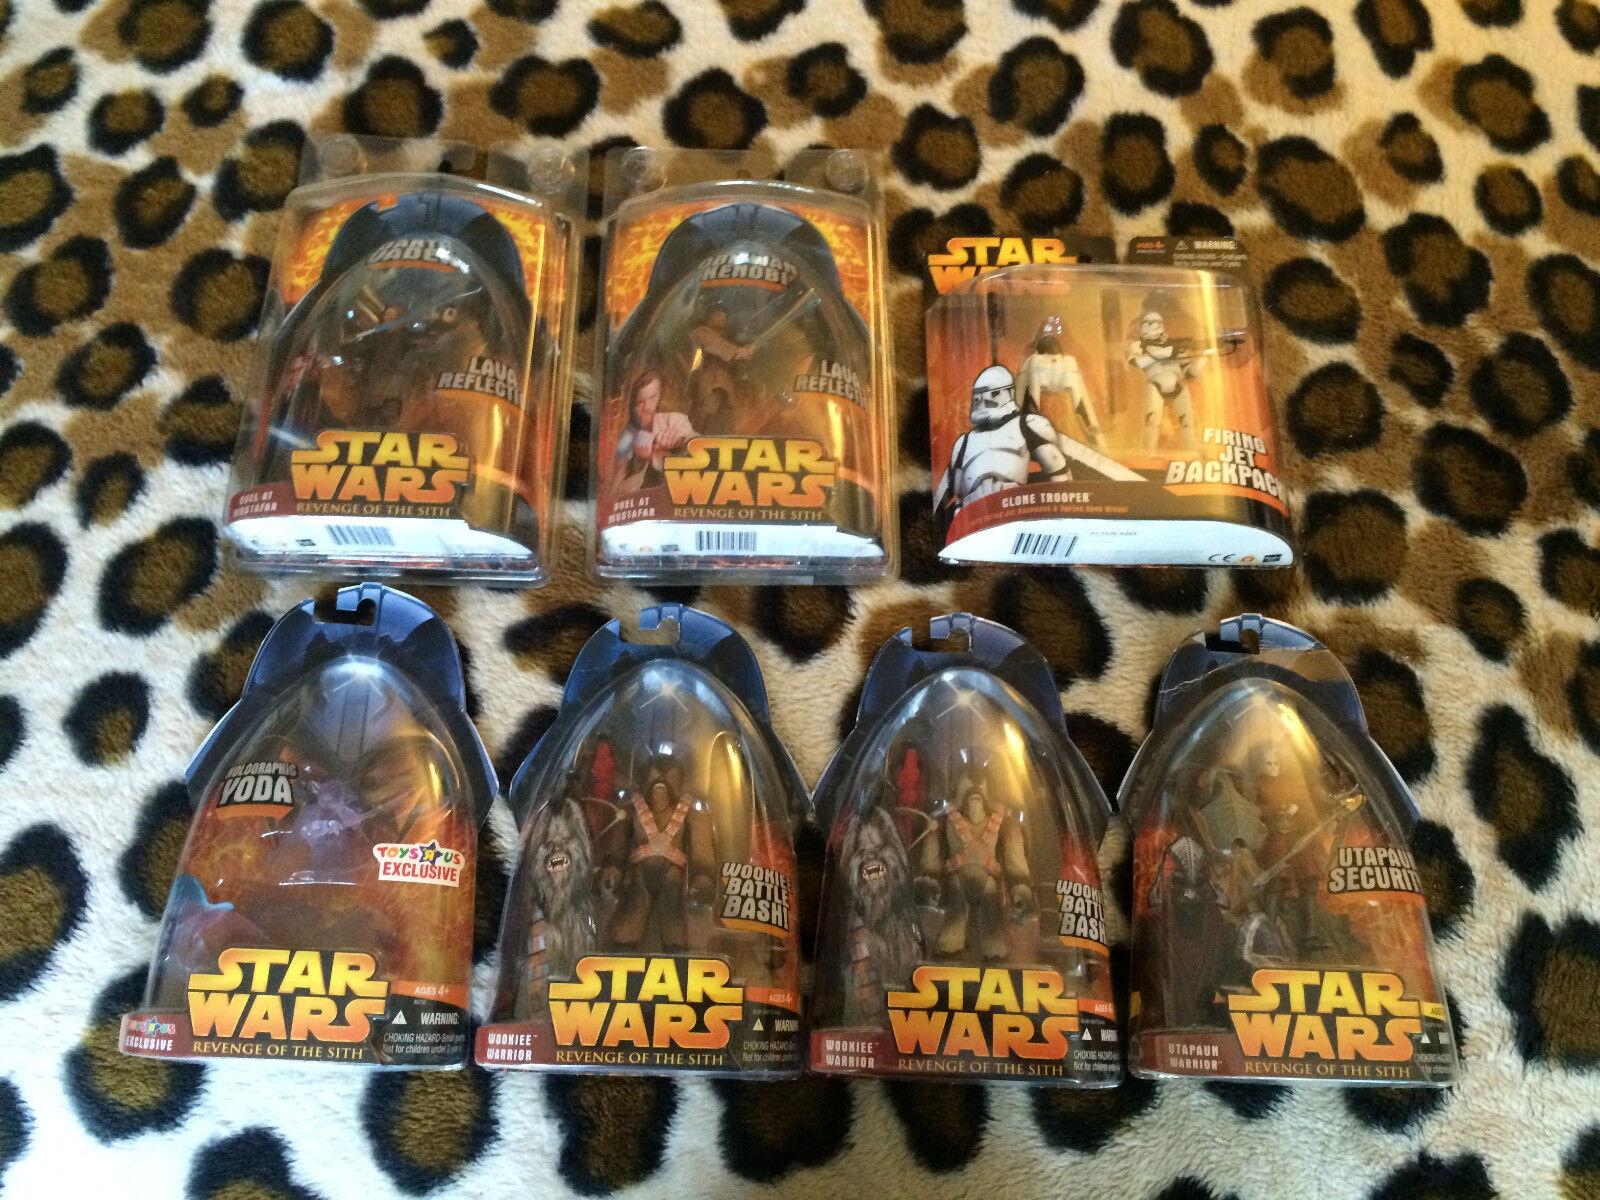 HASBRO STAR WARS redS ( EPISODE 3 ) 7 figure lot store exclusives deluxe clone